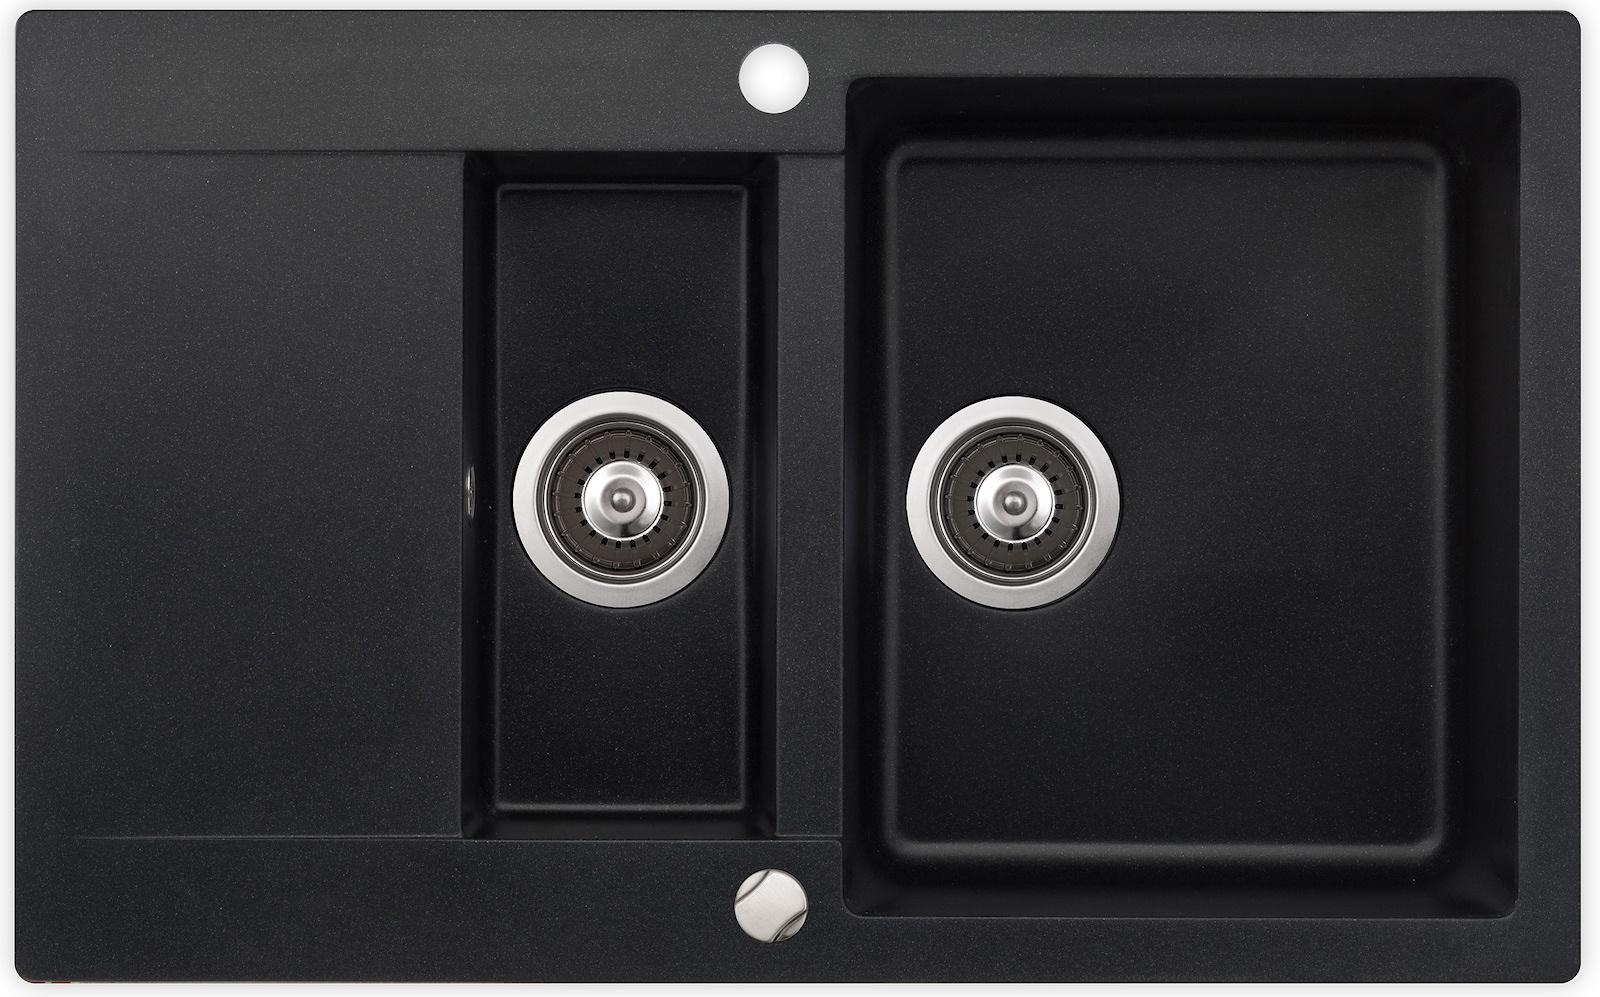 Billig sort kunstgranitvask til køkken